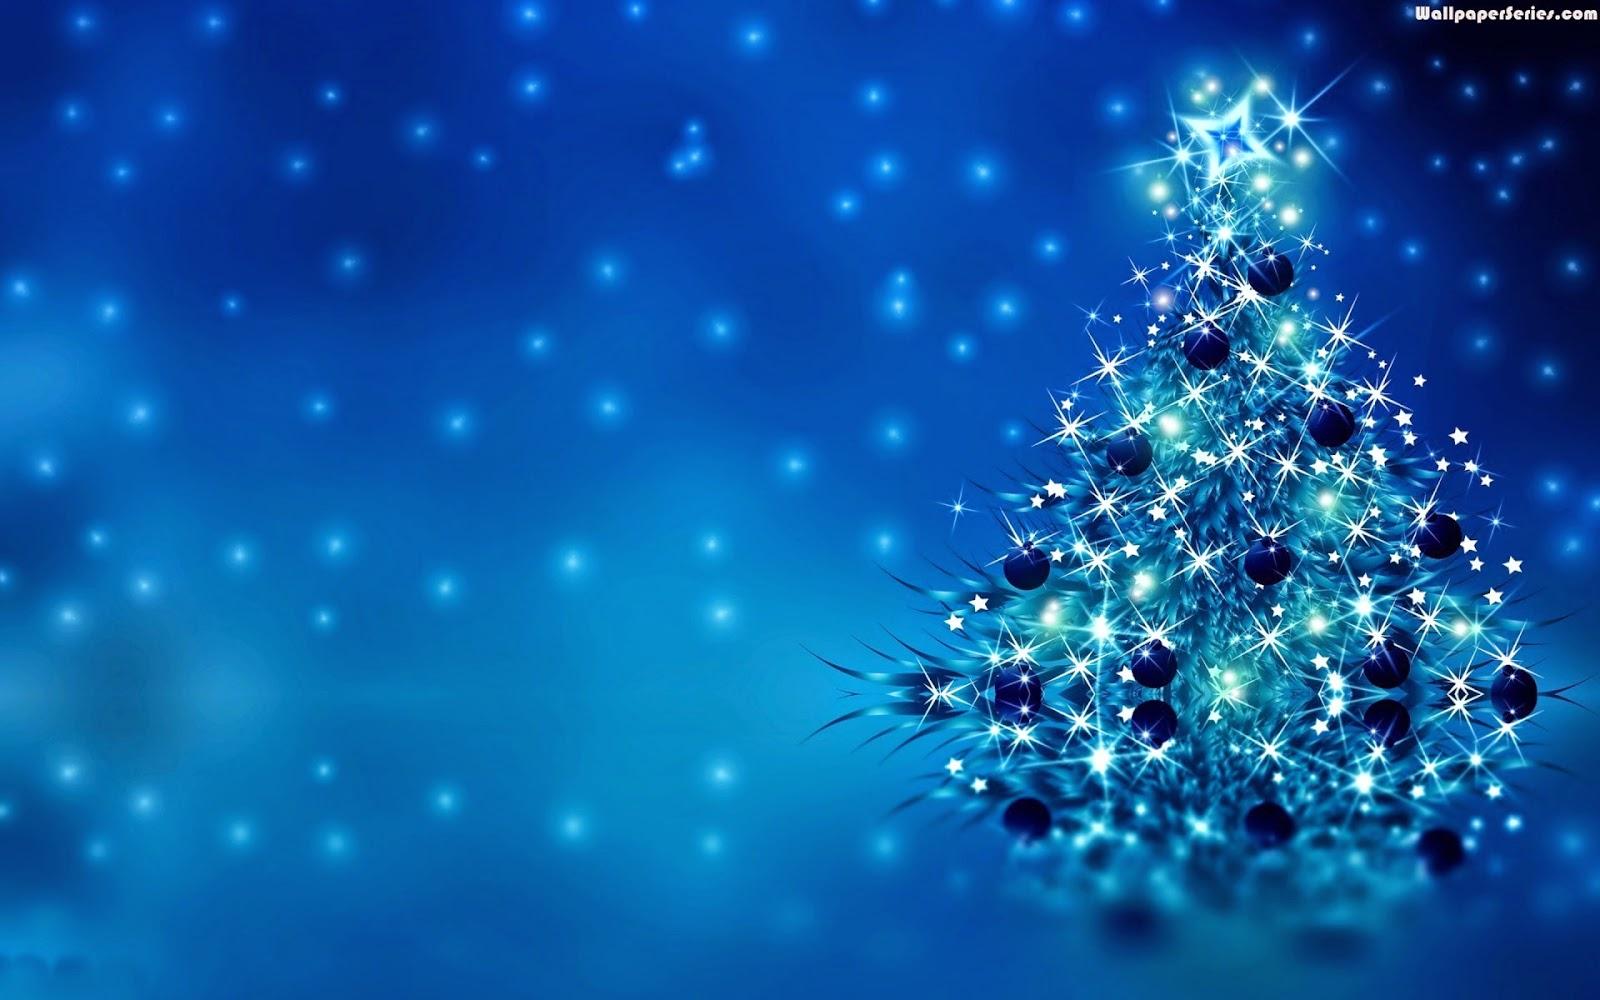 Digital Blasphemy 3d Wallpaper Free Blue Christmas Tree Wallpaper